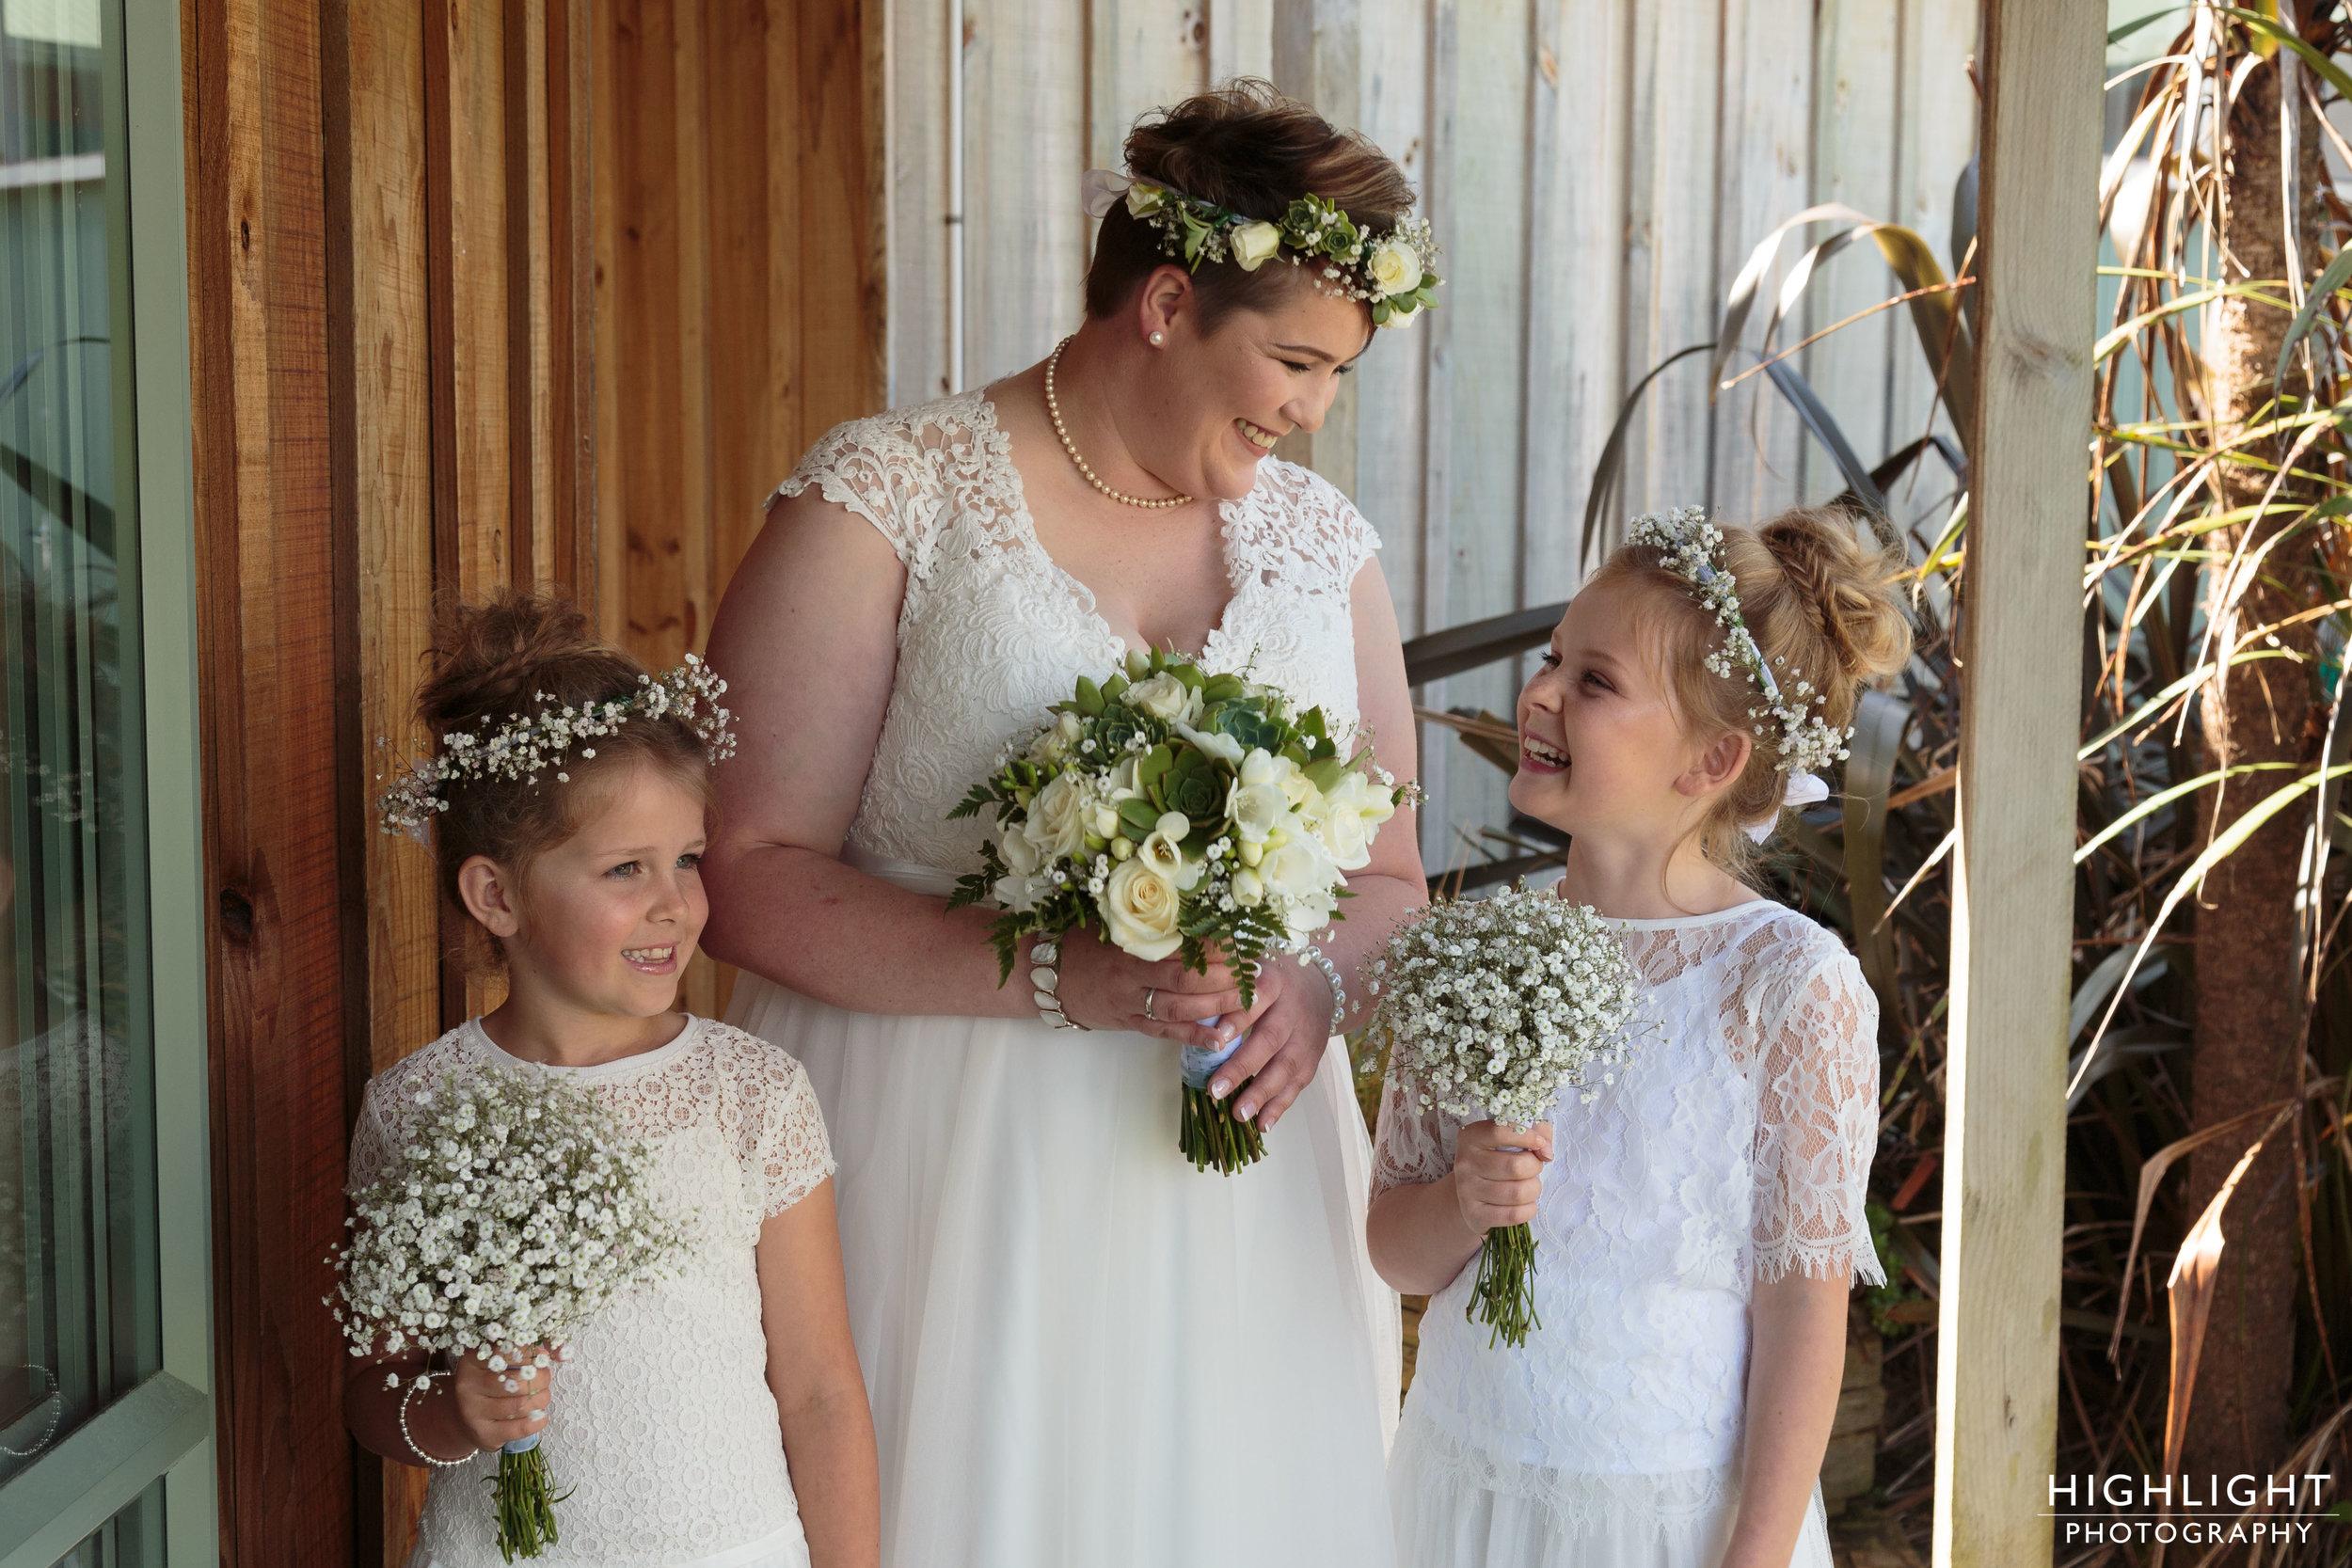 highlight_wedding_photography_makoura_lodge_manawatu_new_zealand-43.jpg